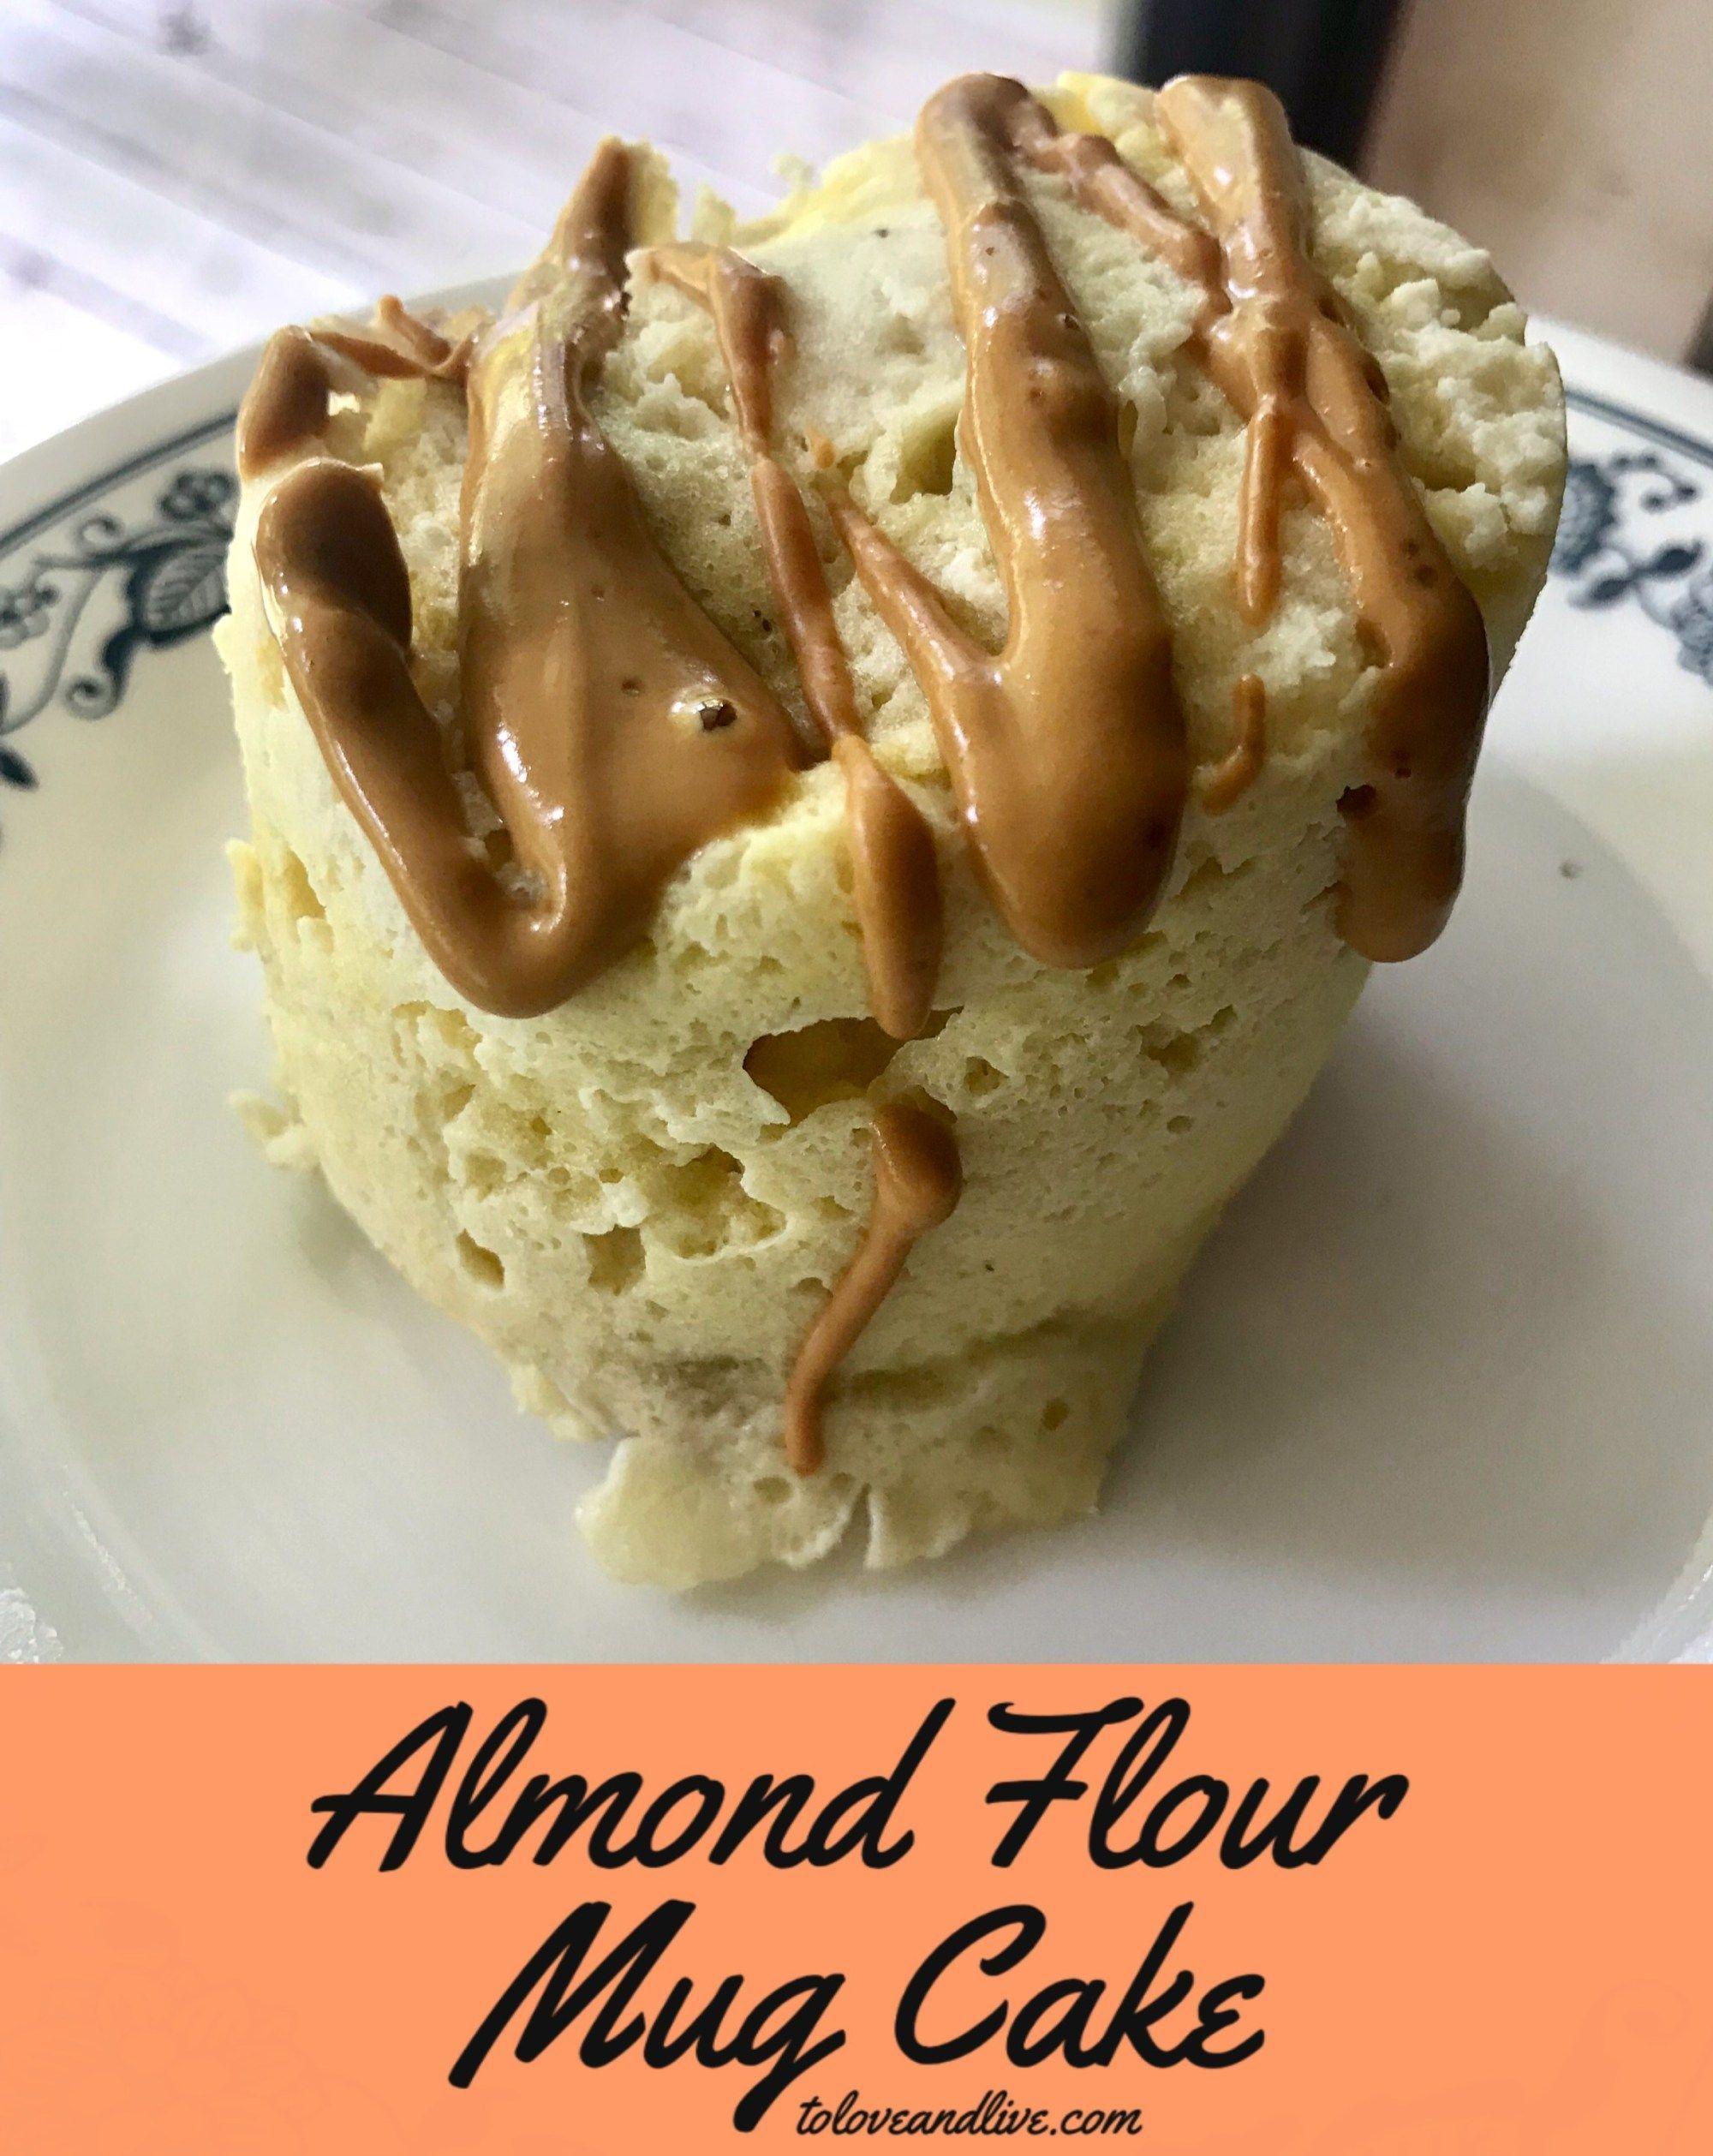 Almond flour mug cake mugcake almond flour mug cake